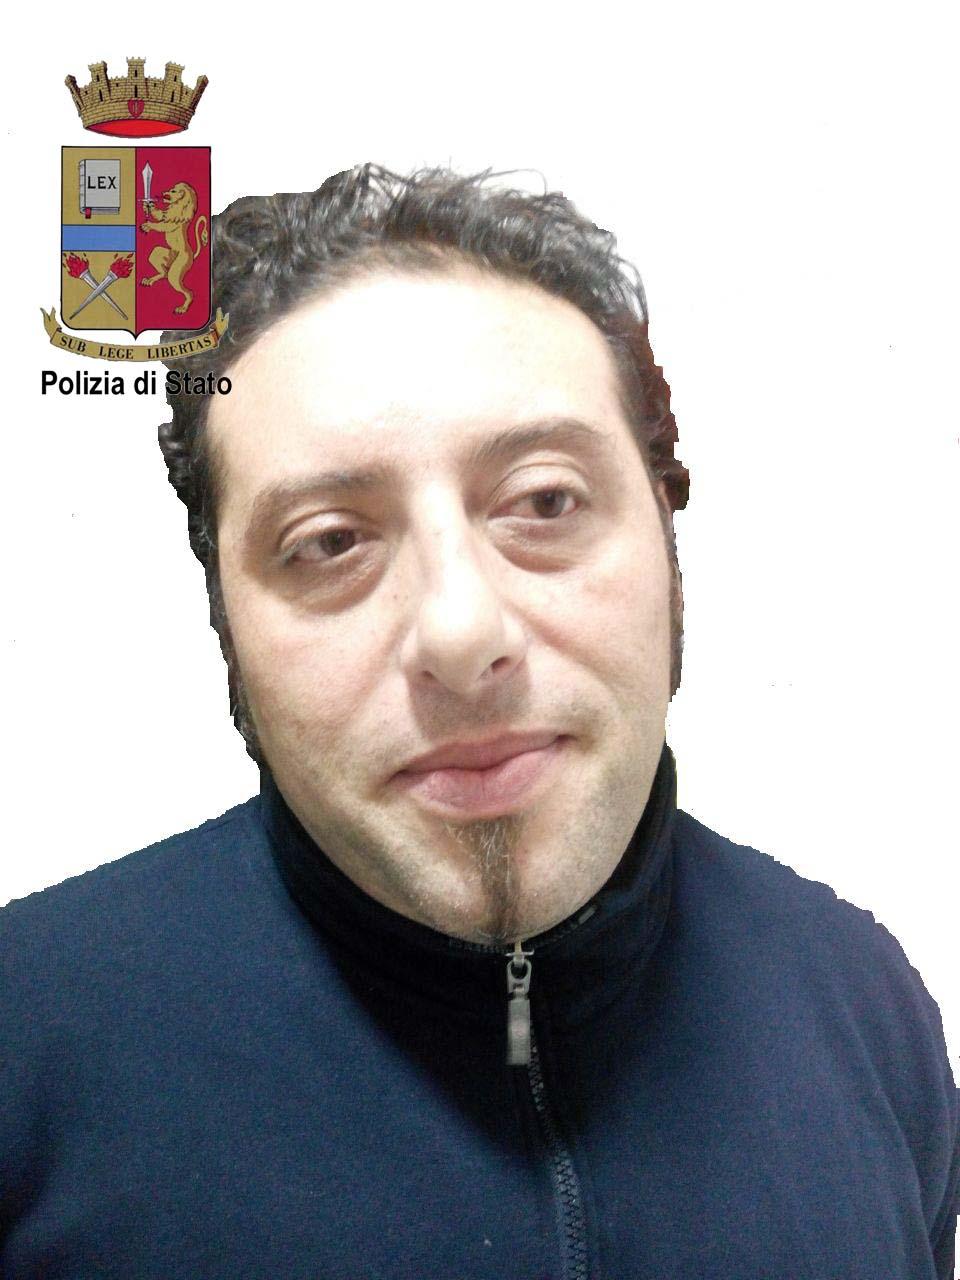 Speciale Massimo